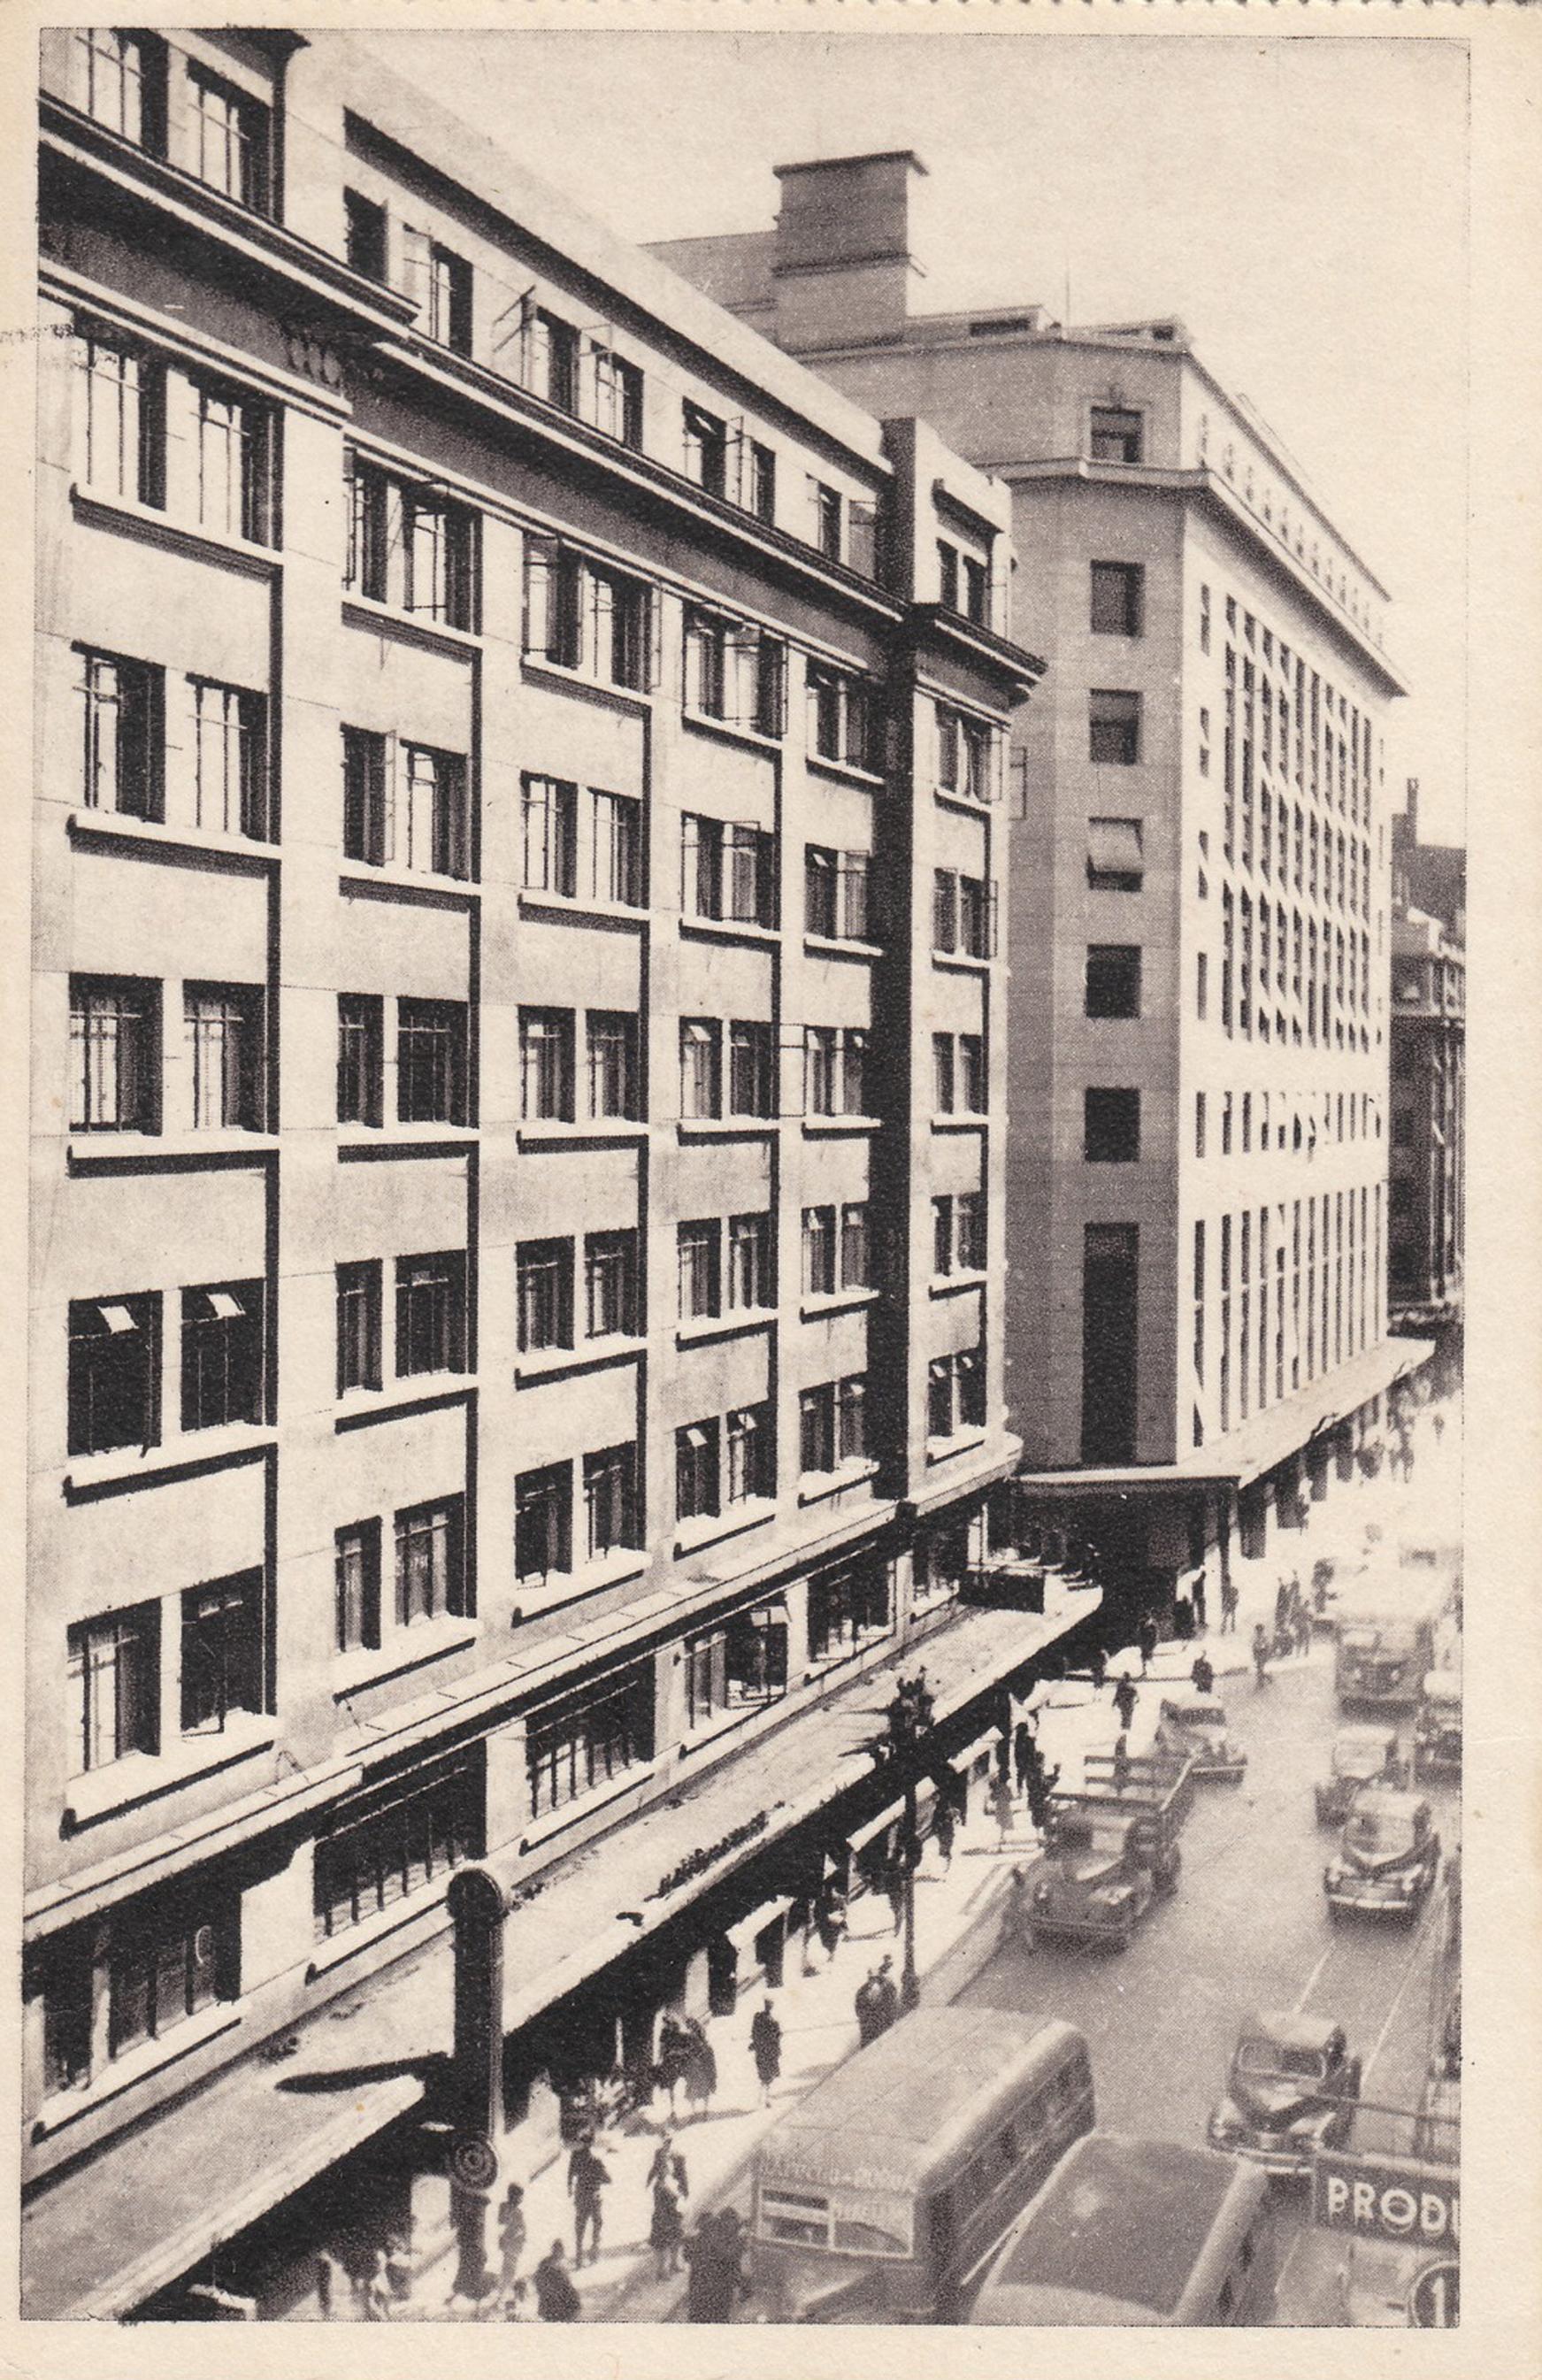 Enterreno - Fotos históricas de chile - fotos antiguas de Chile - Calle Ahumada de Santiago en 1948